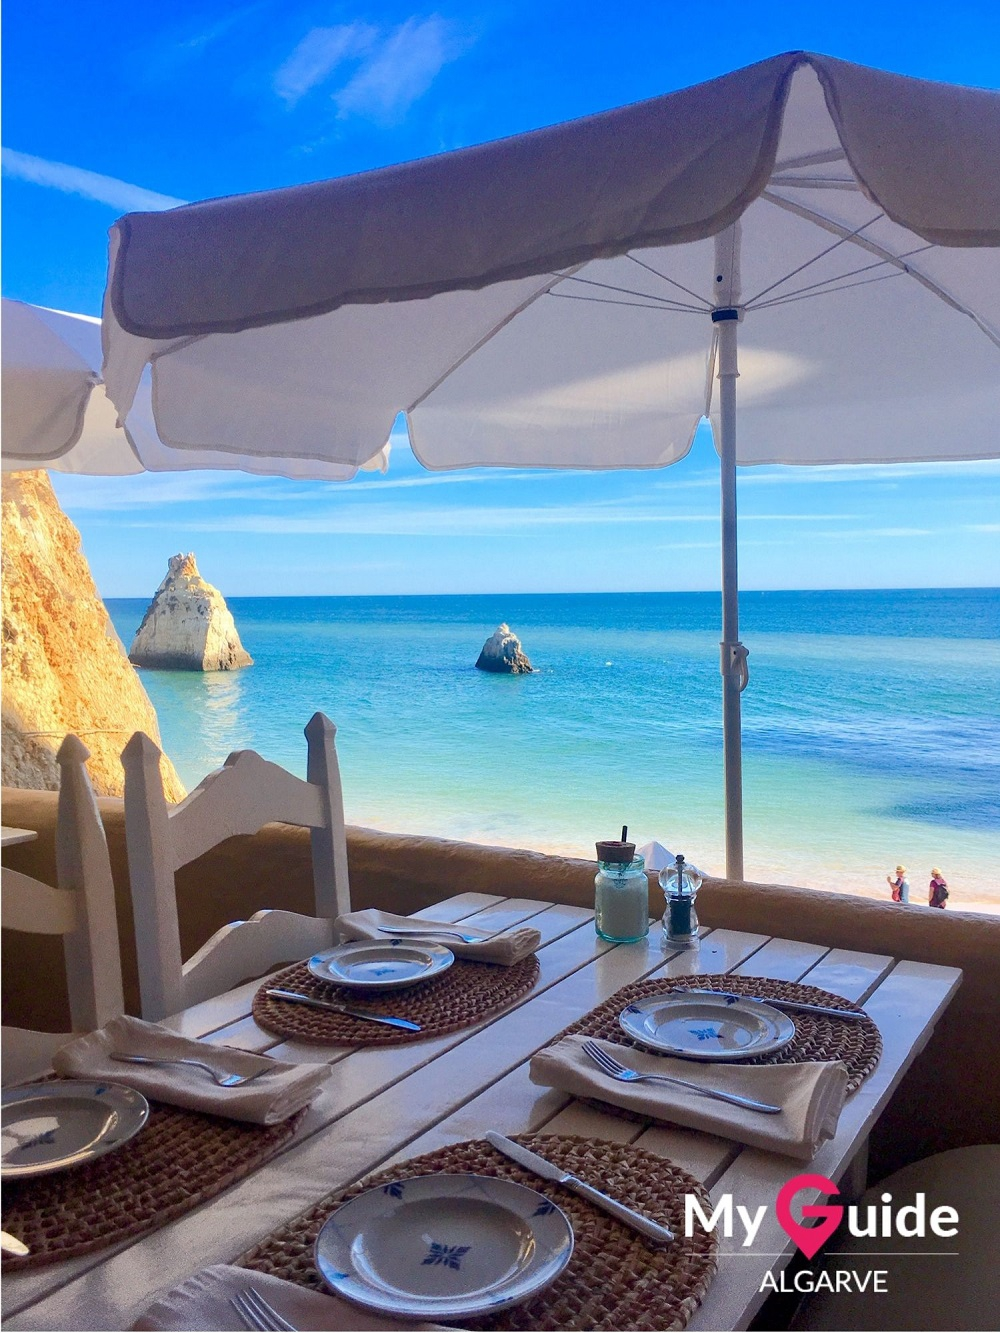 Top 10 Algarve Beach Bars | My Guide Algarve